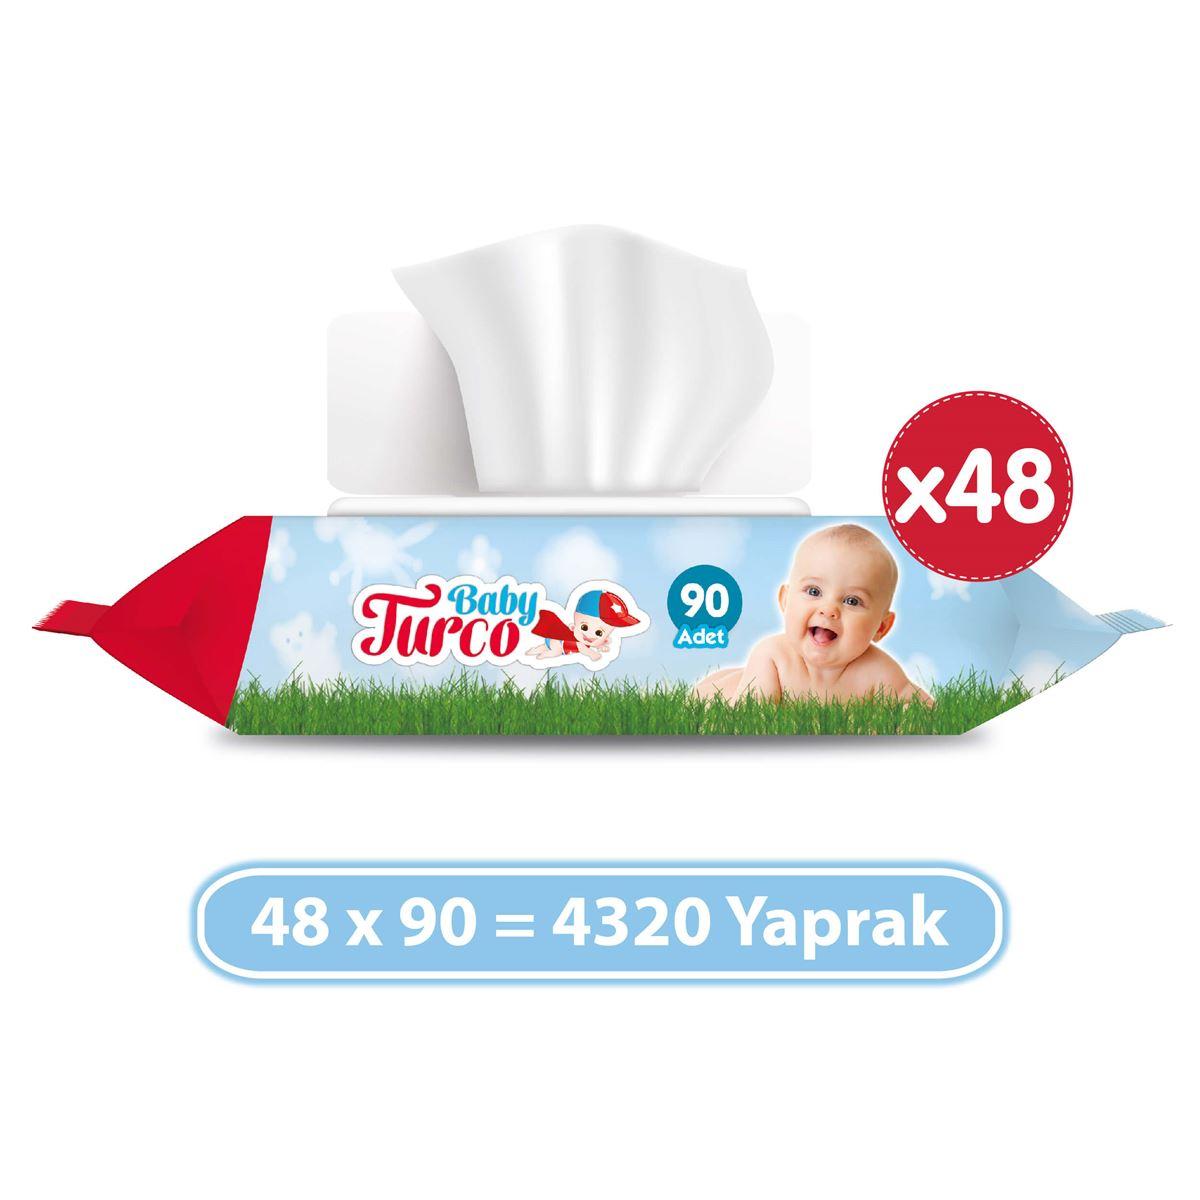 Baby Turco Islak Havlu 48x90'lı